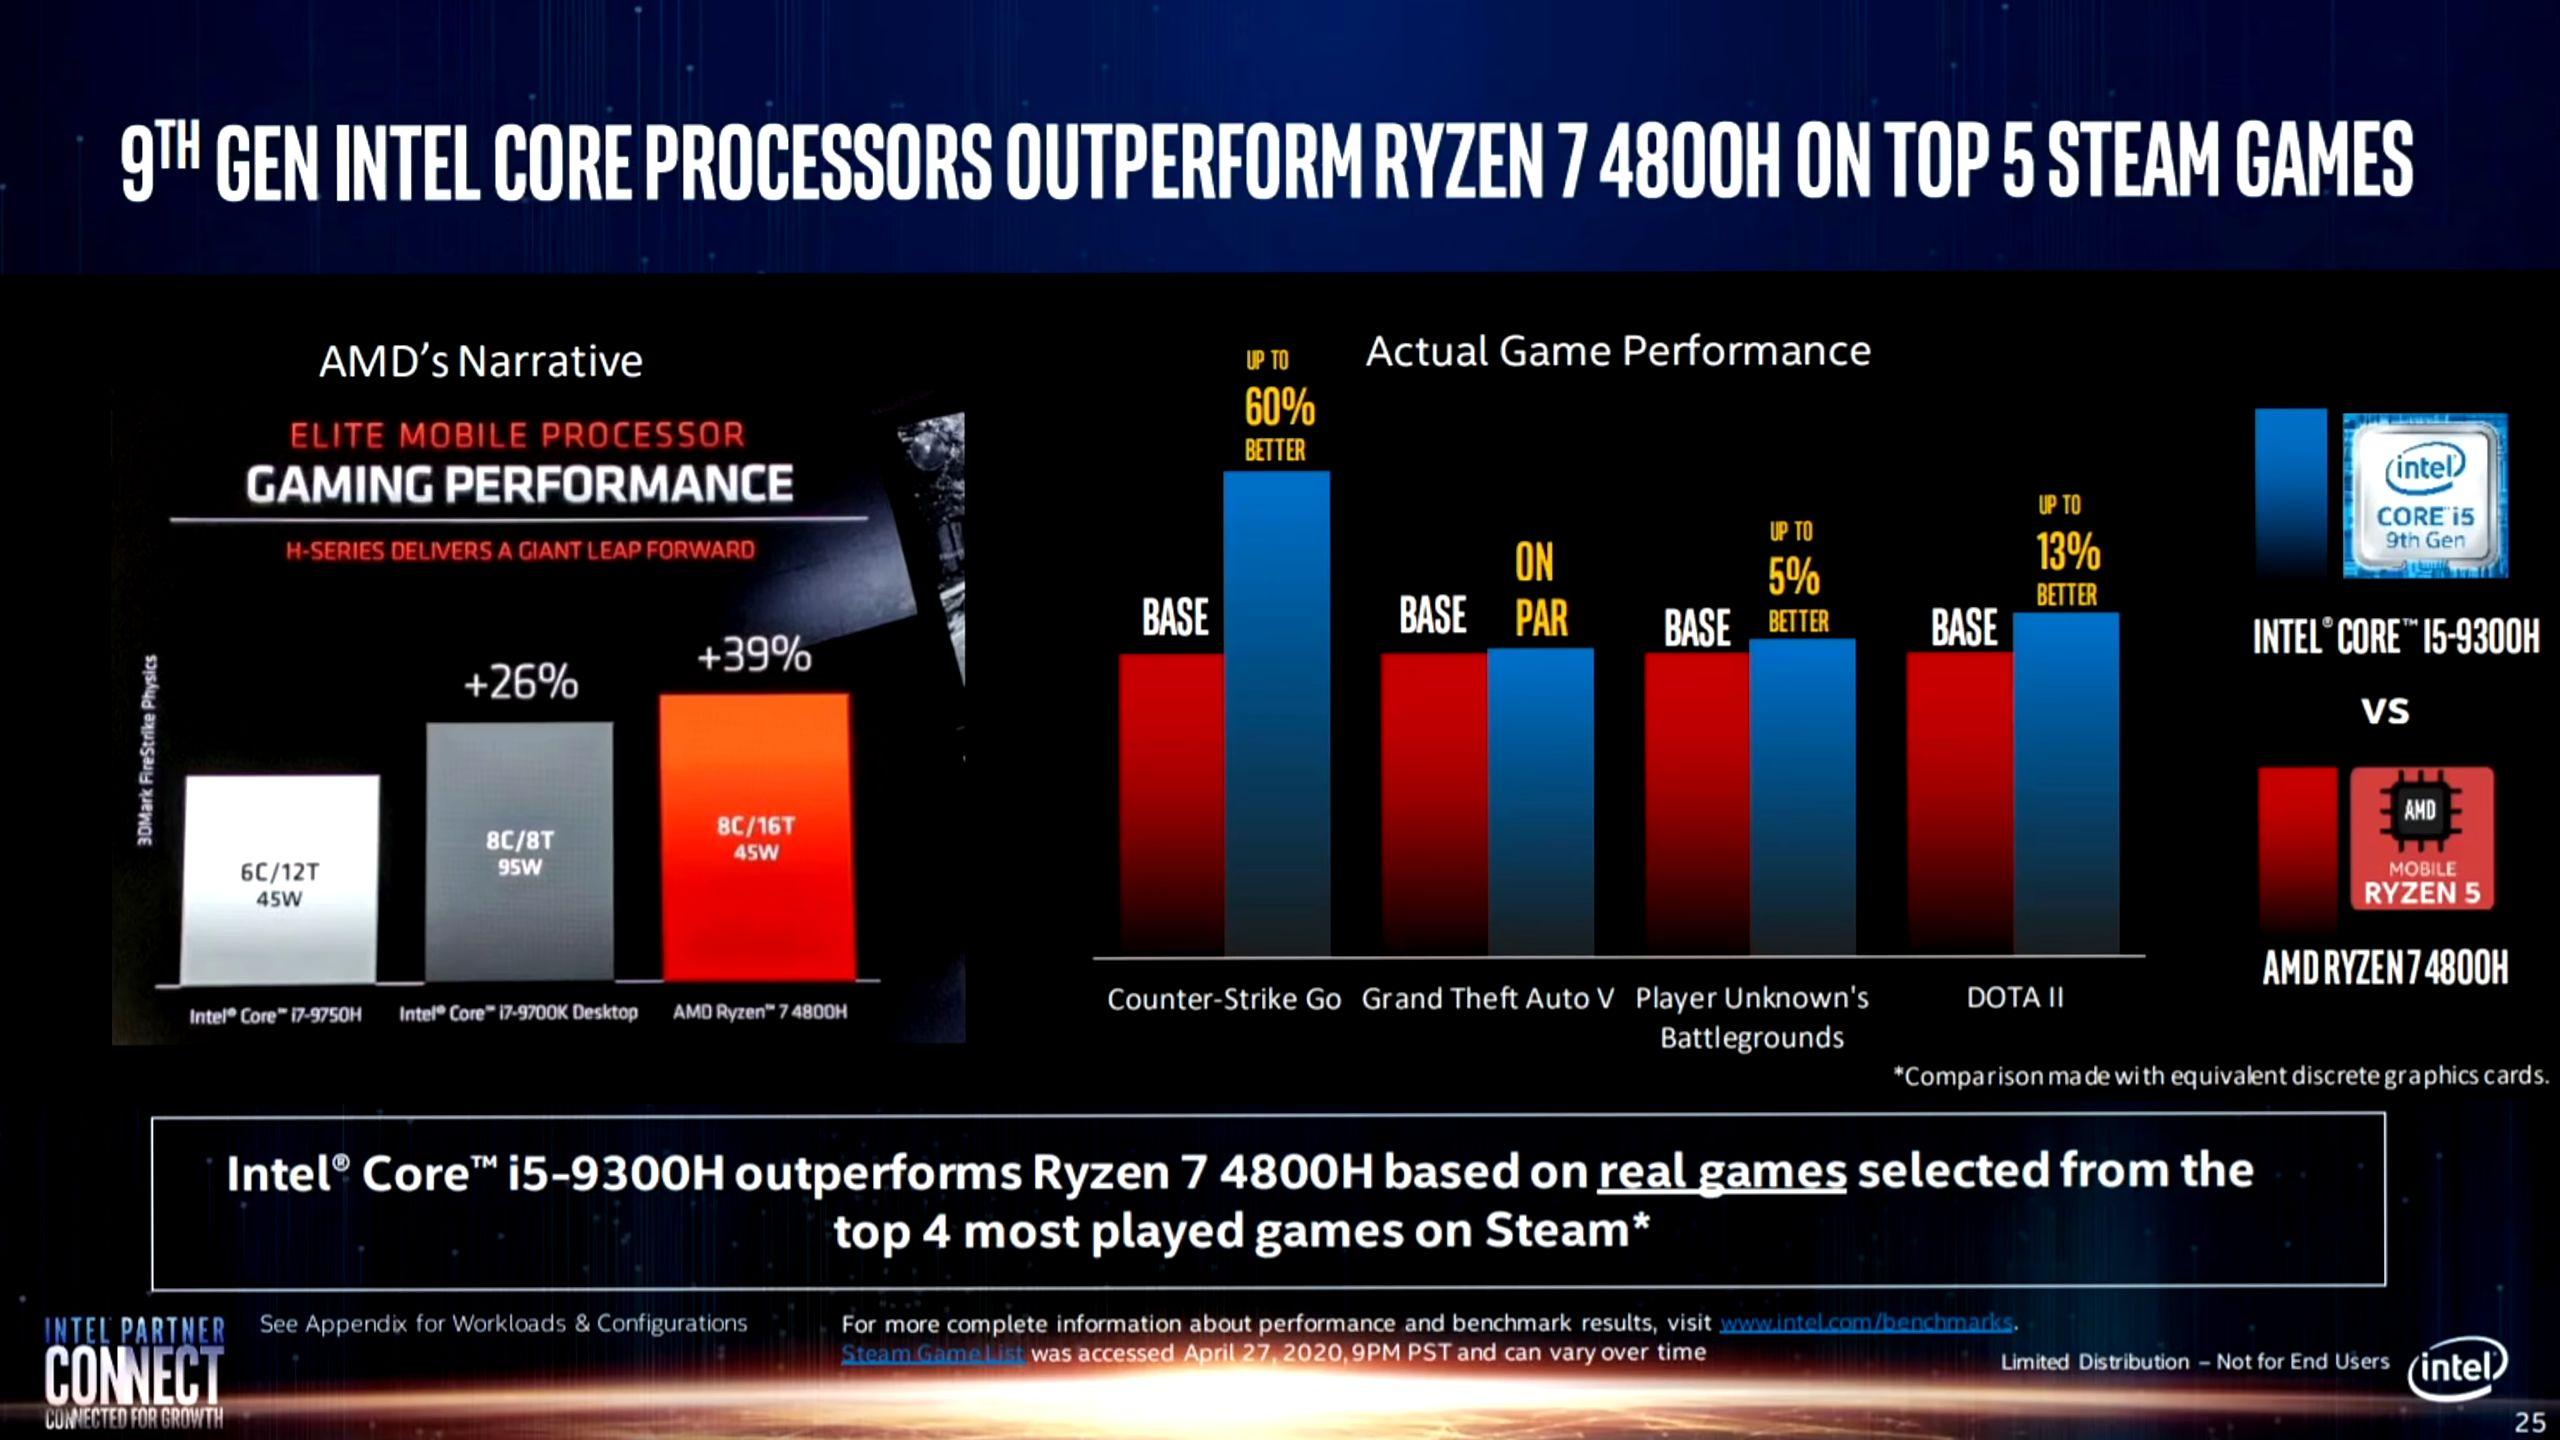 https://cdn.videocardz.com/1/2020/06/Intel-Marketing-Slides-14.jpg